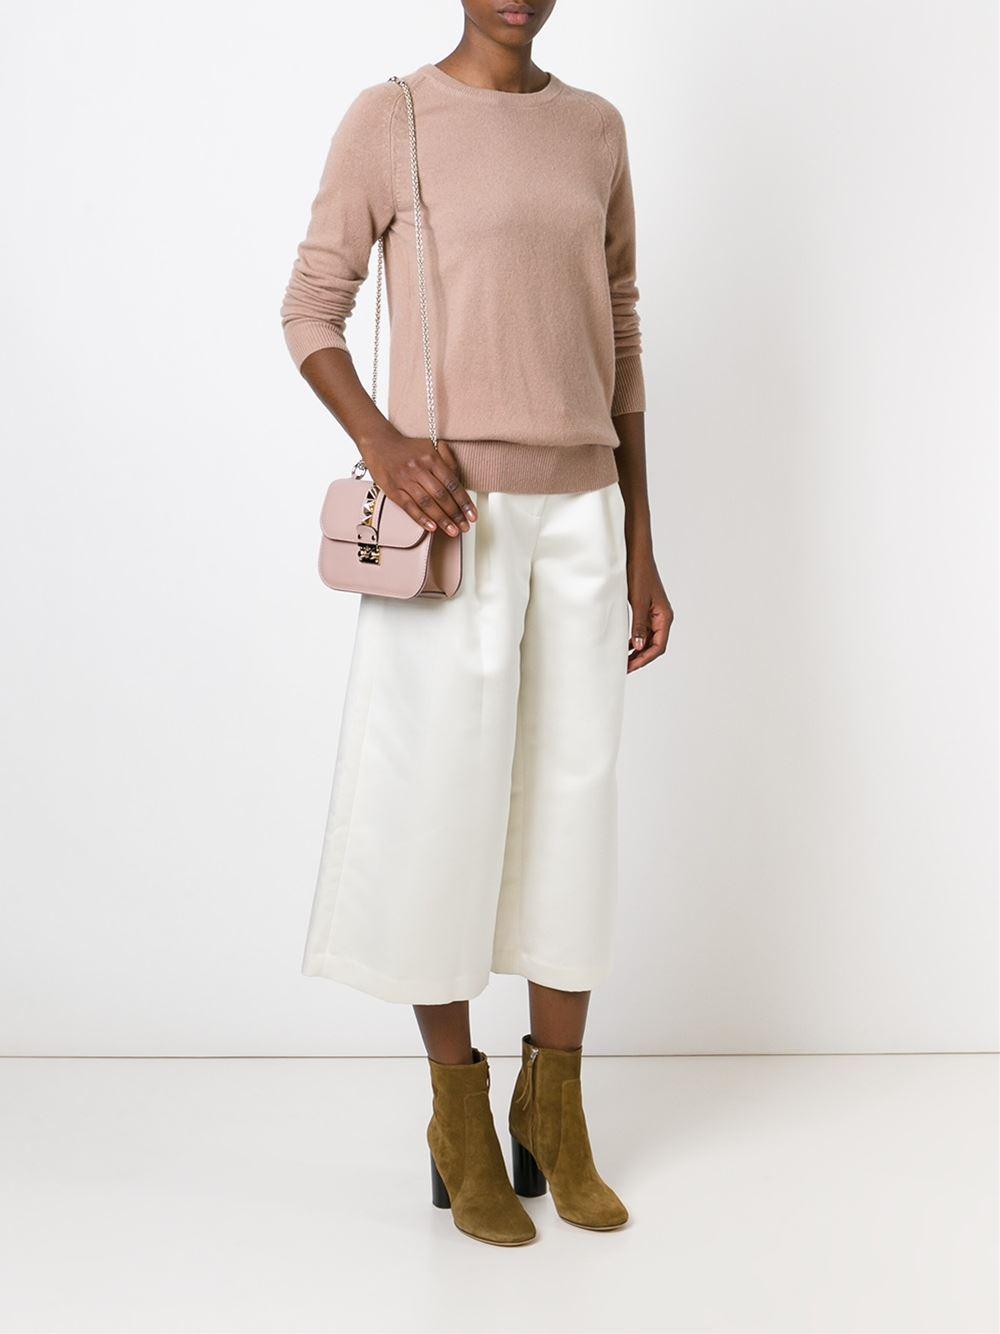 Valentino Bag: Women's Handbags | eBay